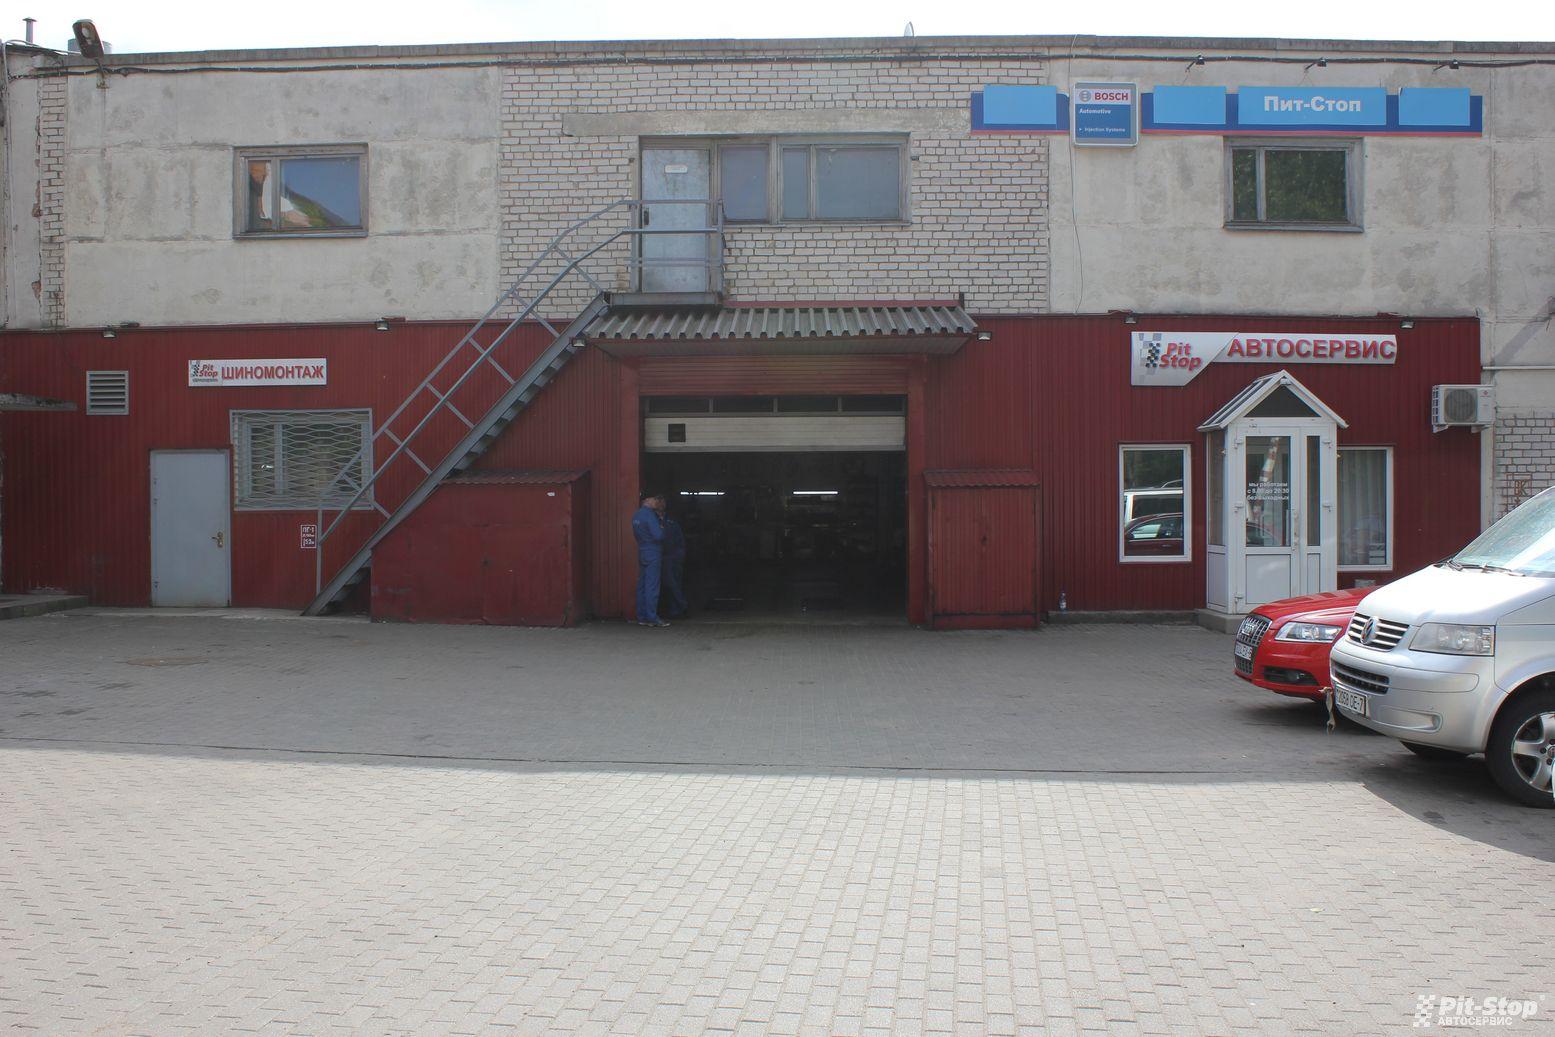 Автосервис Pit-Stop Motors 3